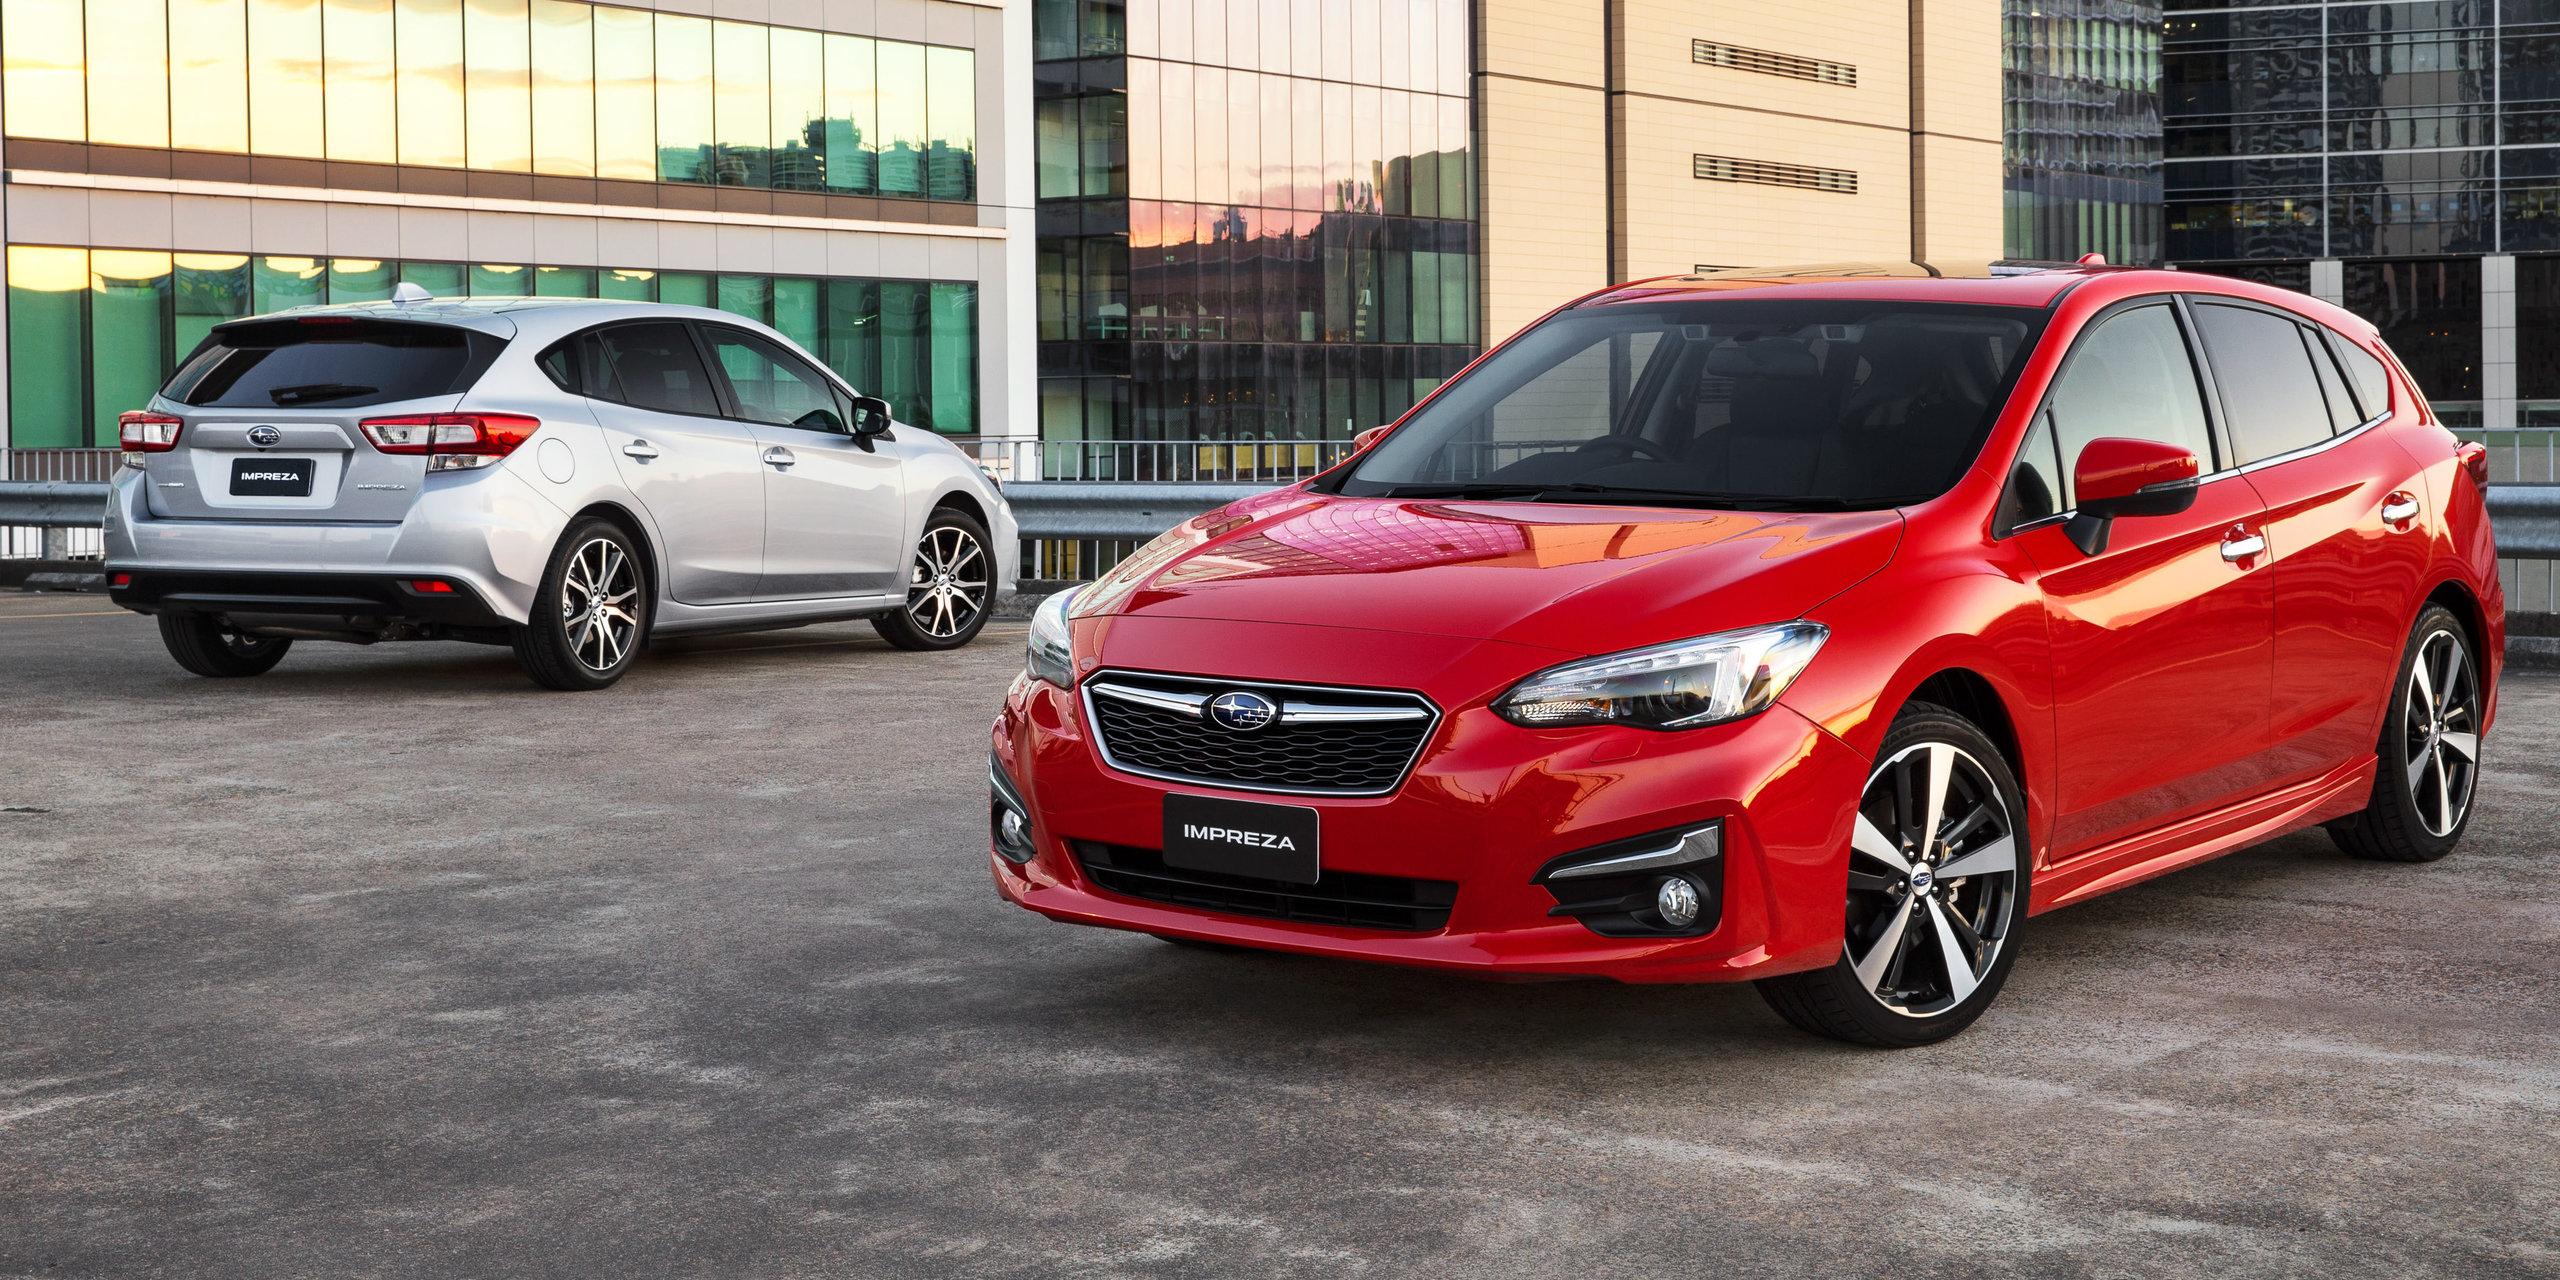 Subaru Impreza 2017 Review Brand New Drivers Chassis